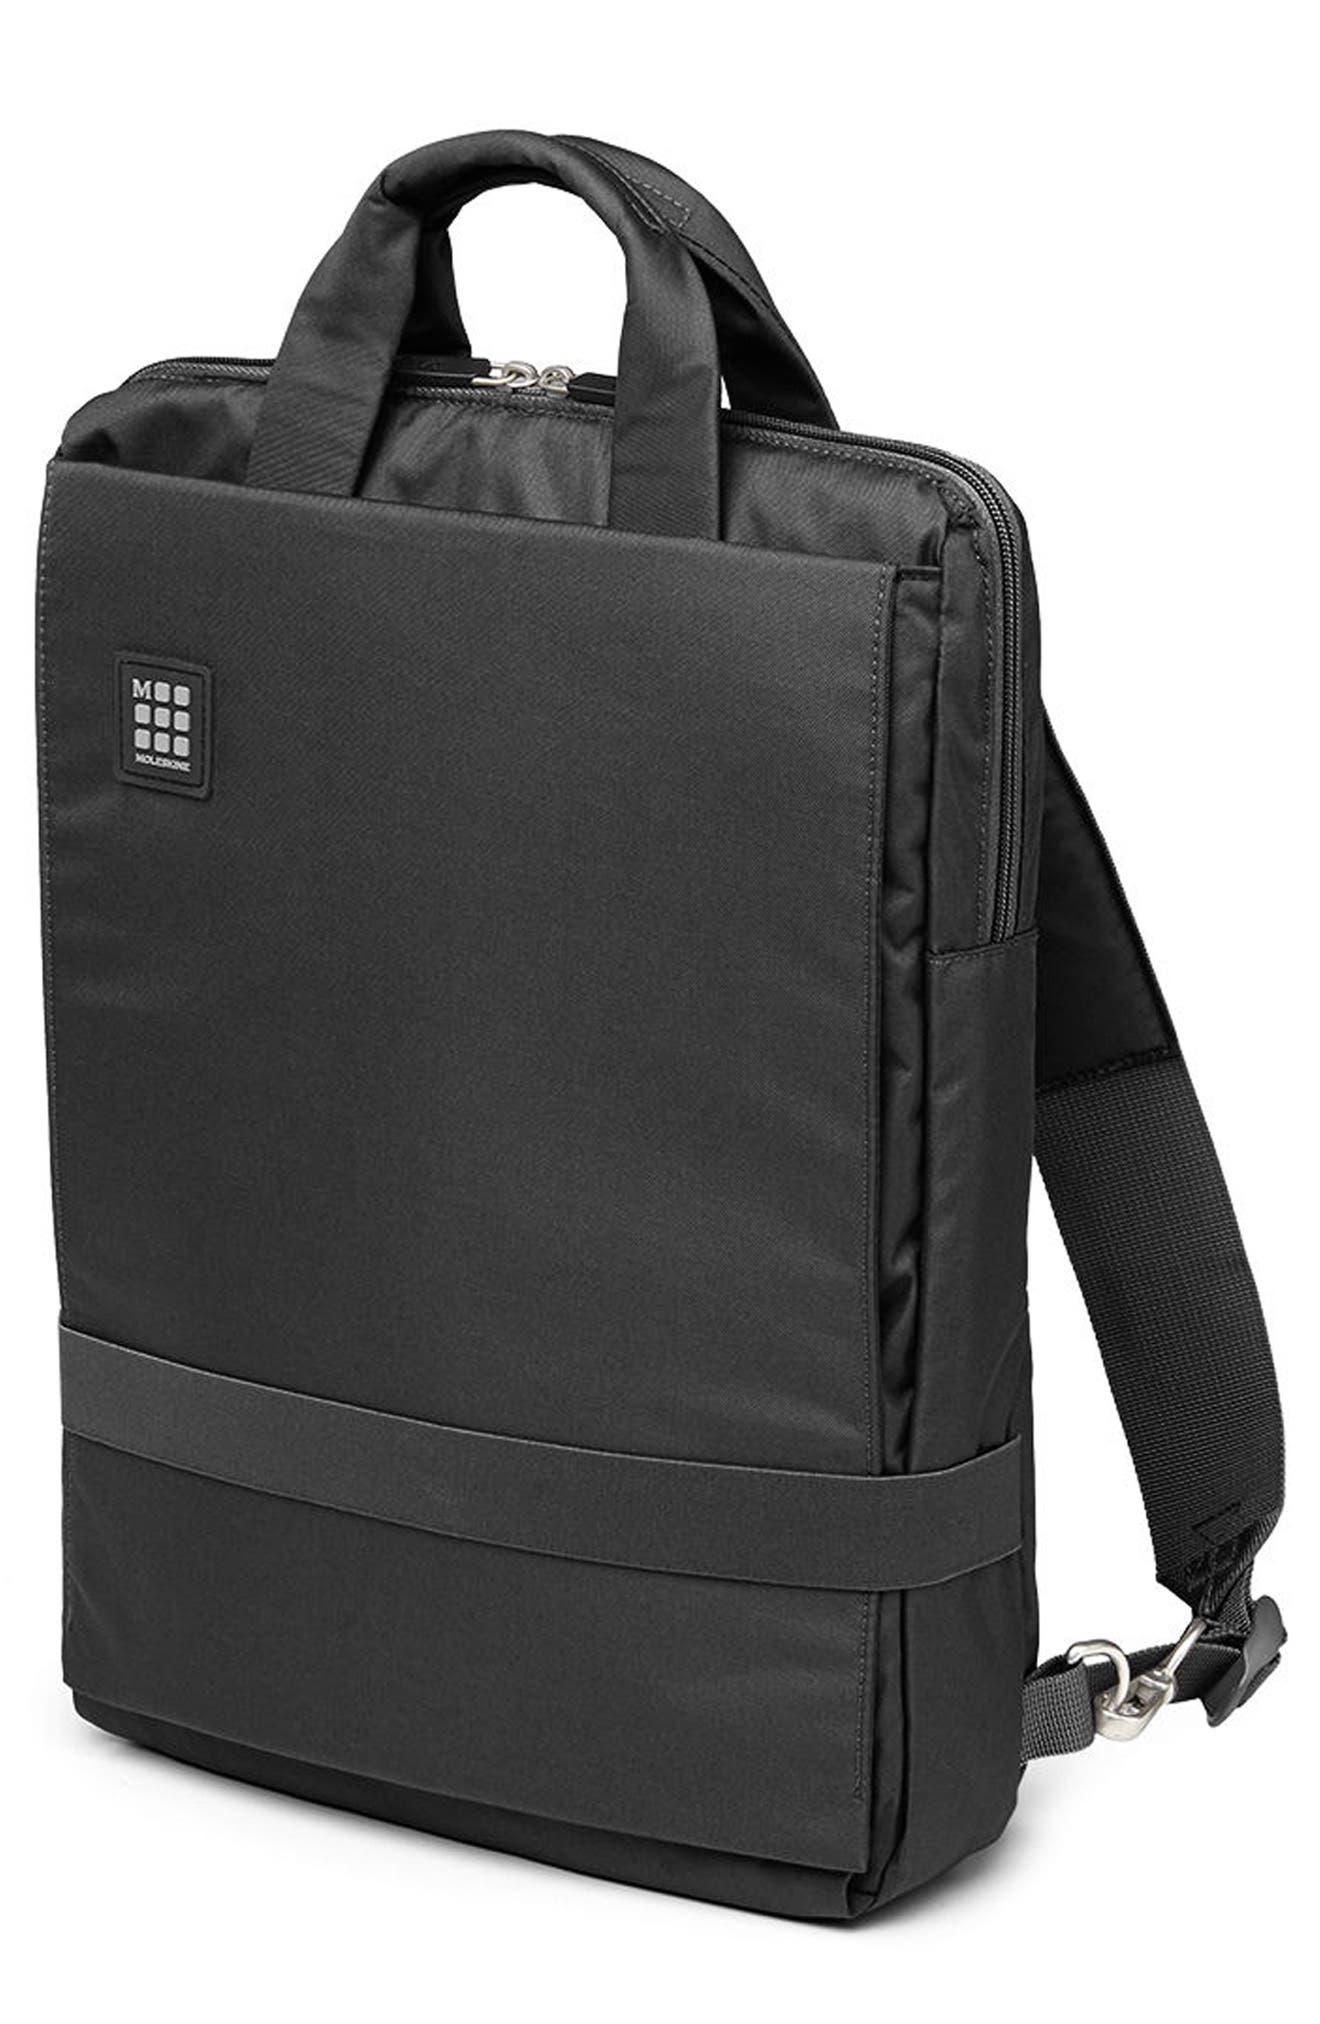 Main Image - Moleskine Vertical Device Bag